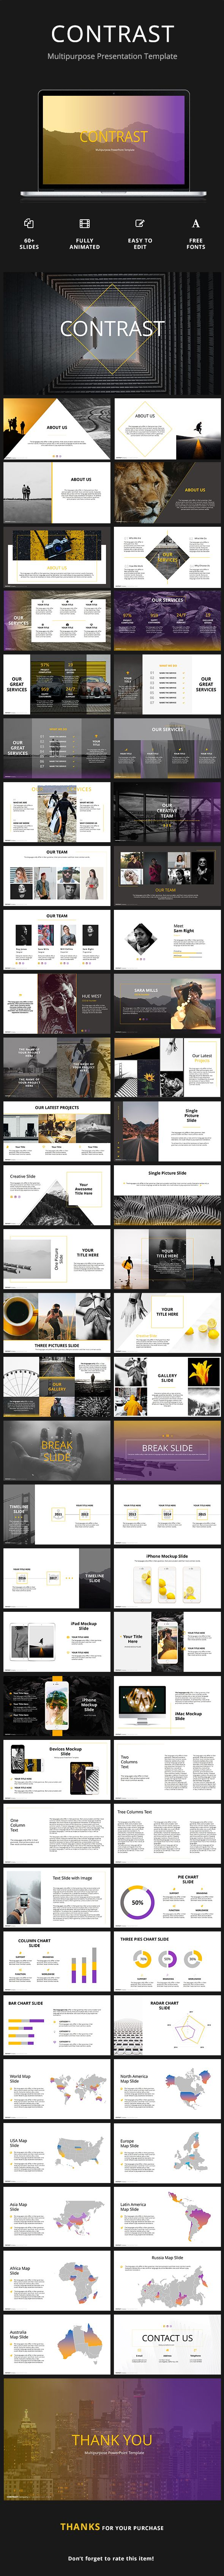 Contrast - Creative Powerpoint Template - #PowerPoint Templates Presentation Templates